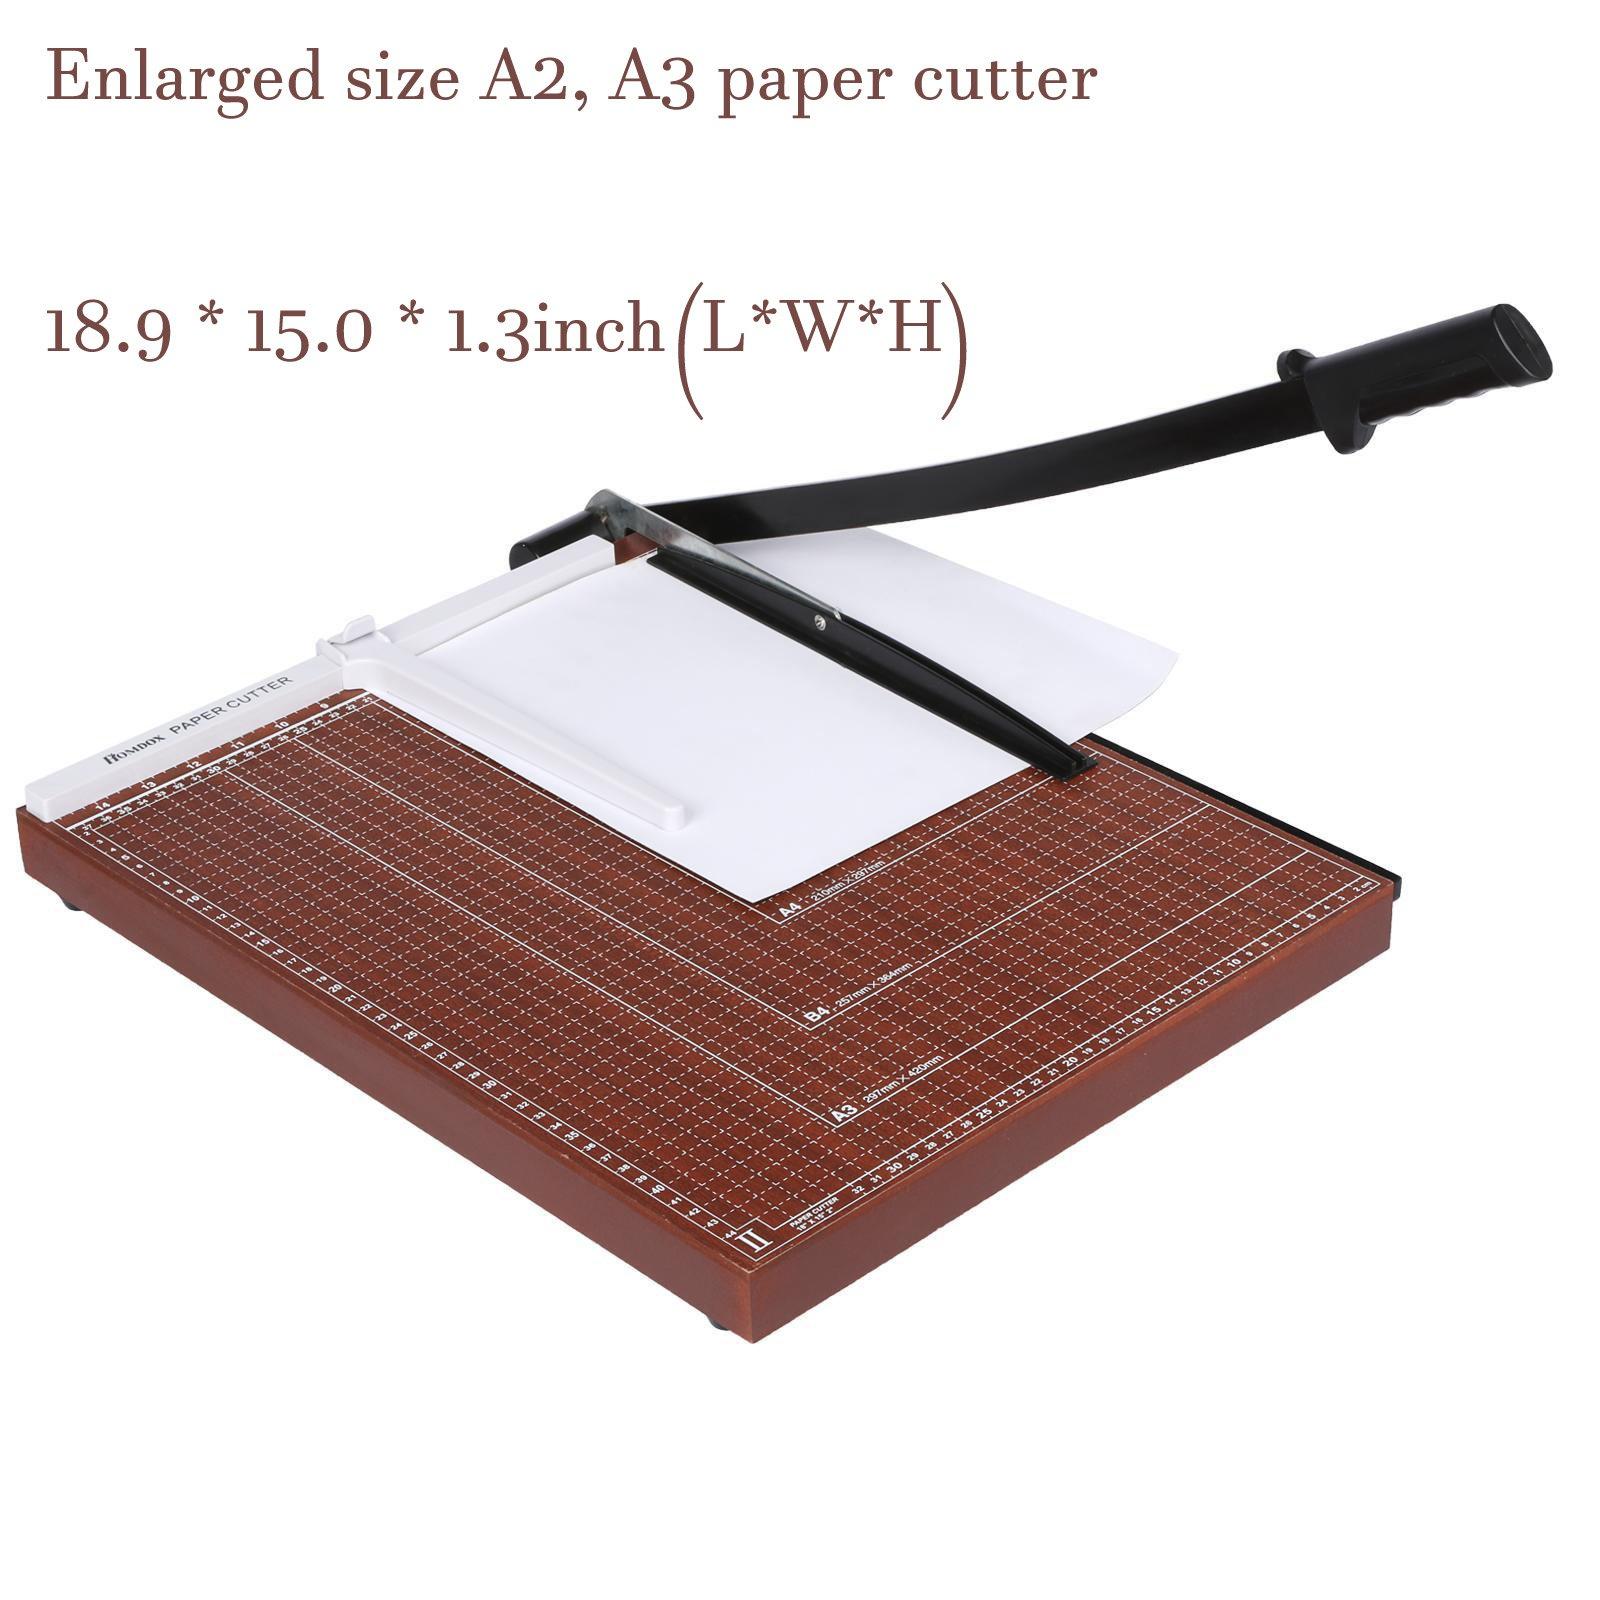 Professional Office Home Guillotine A2 A3 Paper Cutter Black Steel Durable Accurate Desk Tops Paper Cutter Trimmer Scrap Machine (Red, 18.9 x 15.0 x 1.3inch)